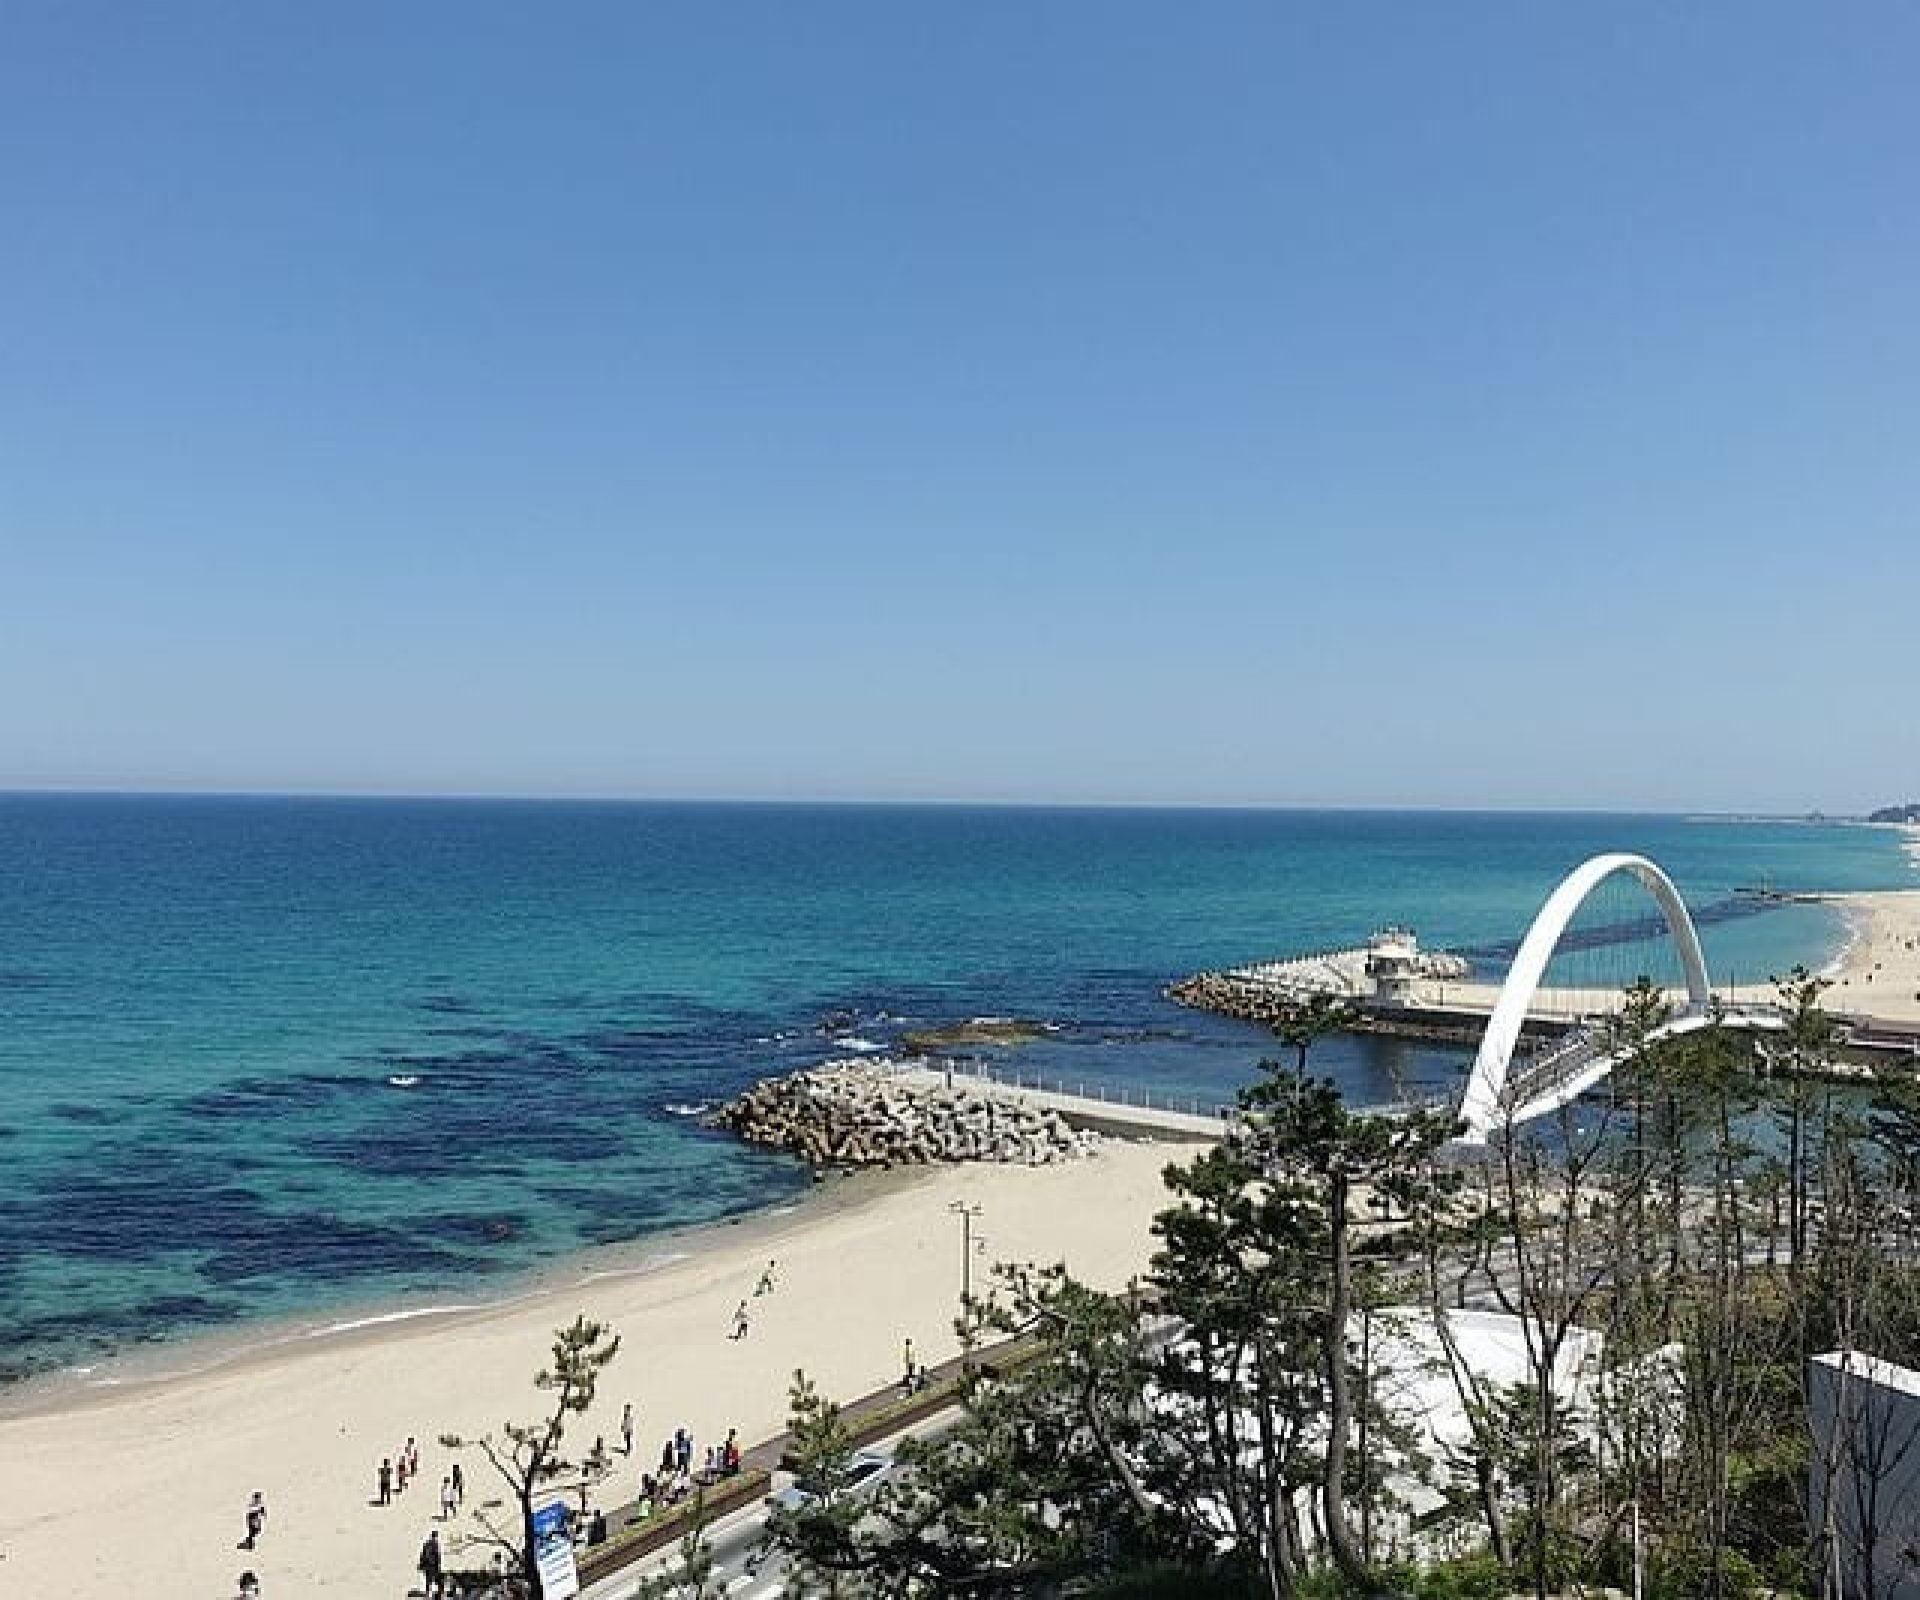 Jumunjin Beach (주문진해변) | Gangneung-si, Gangwon-do